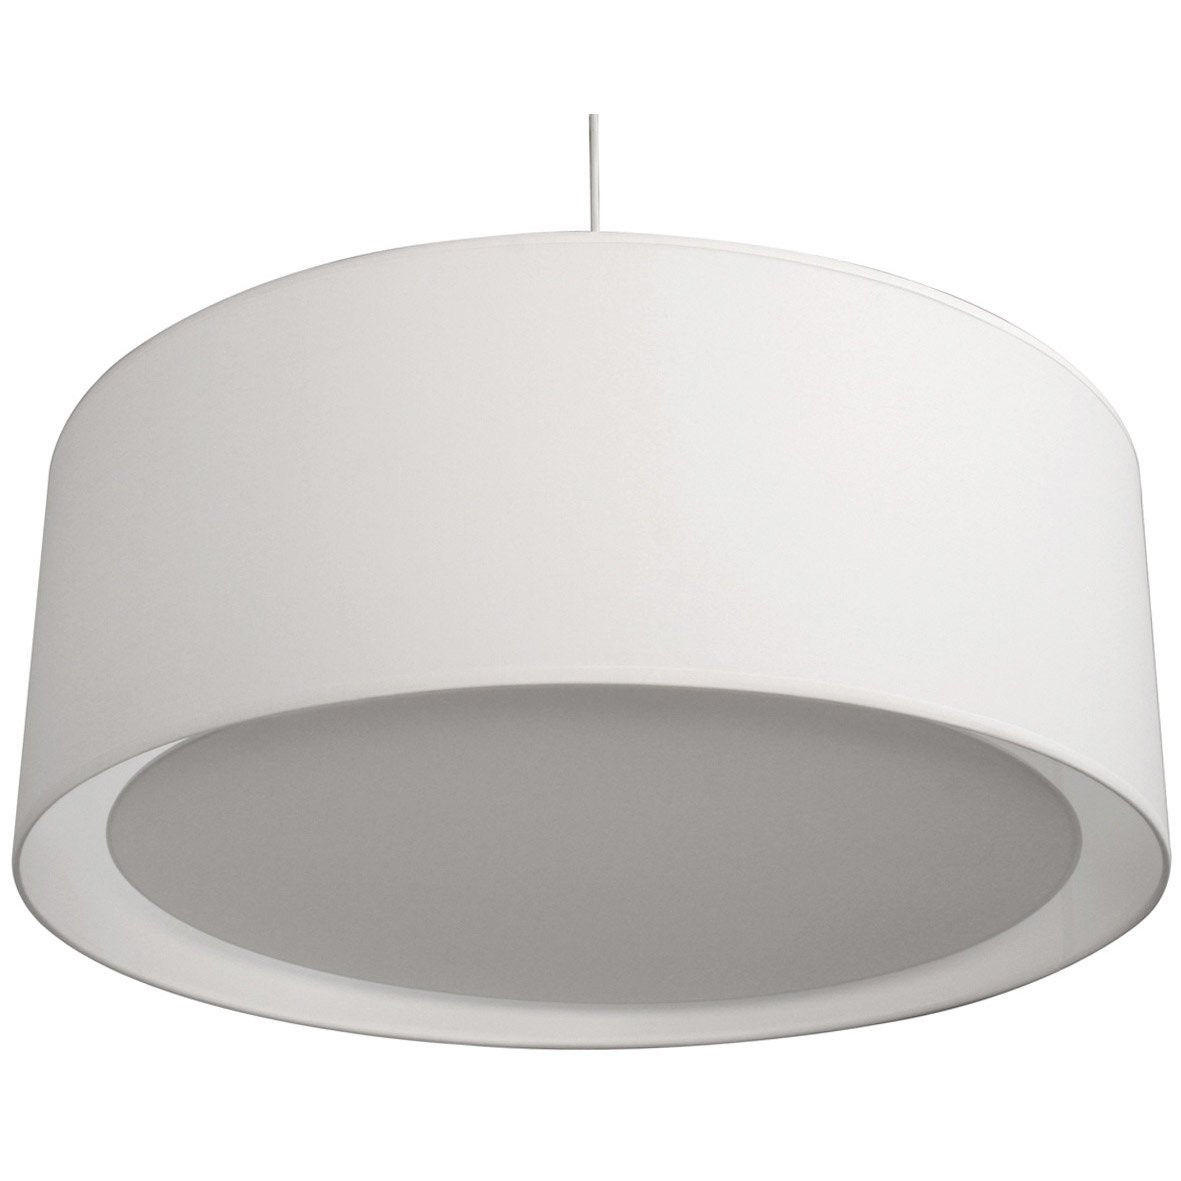 Suspension e27 design essentiel coton blanc blanc n 0 1 x 60 w inspire leroy merlin - Suspension led leroy merlin ...